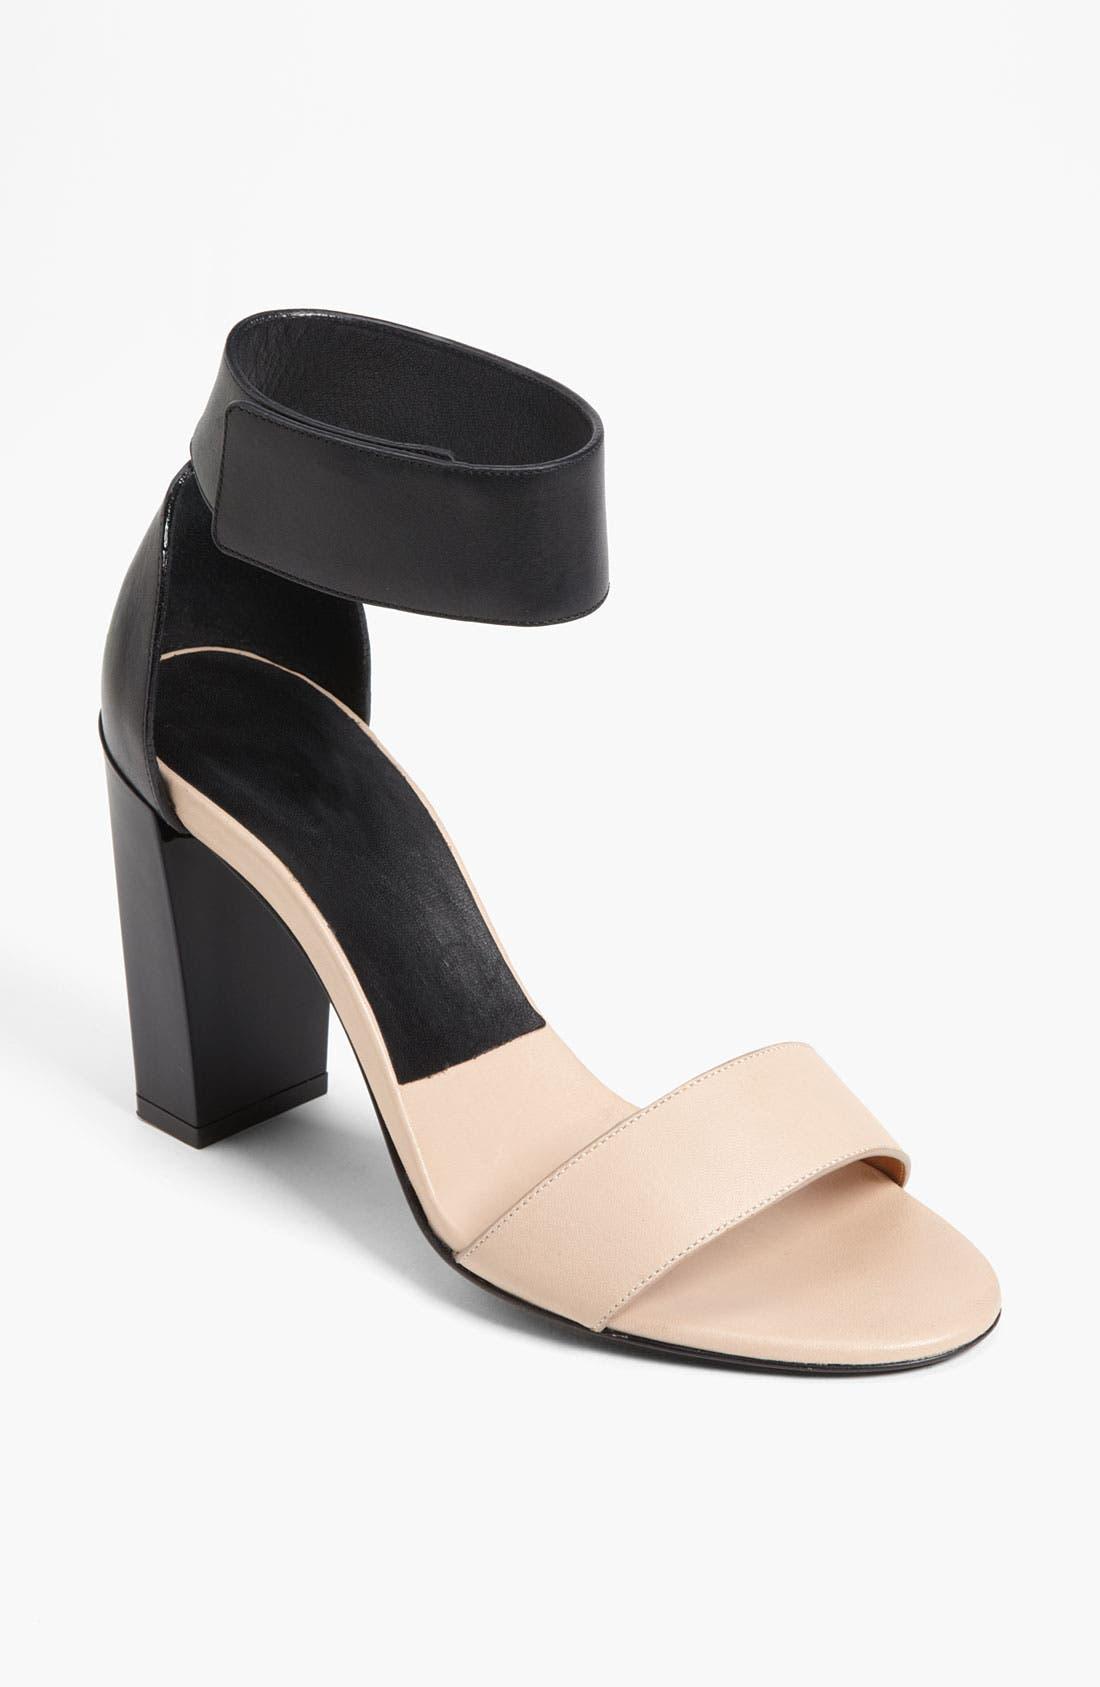 Main Image - Chloé Ankle Strap Sandal